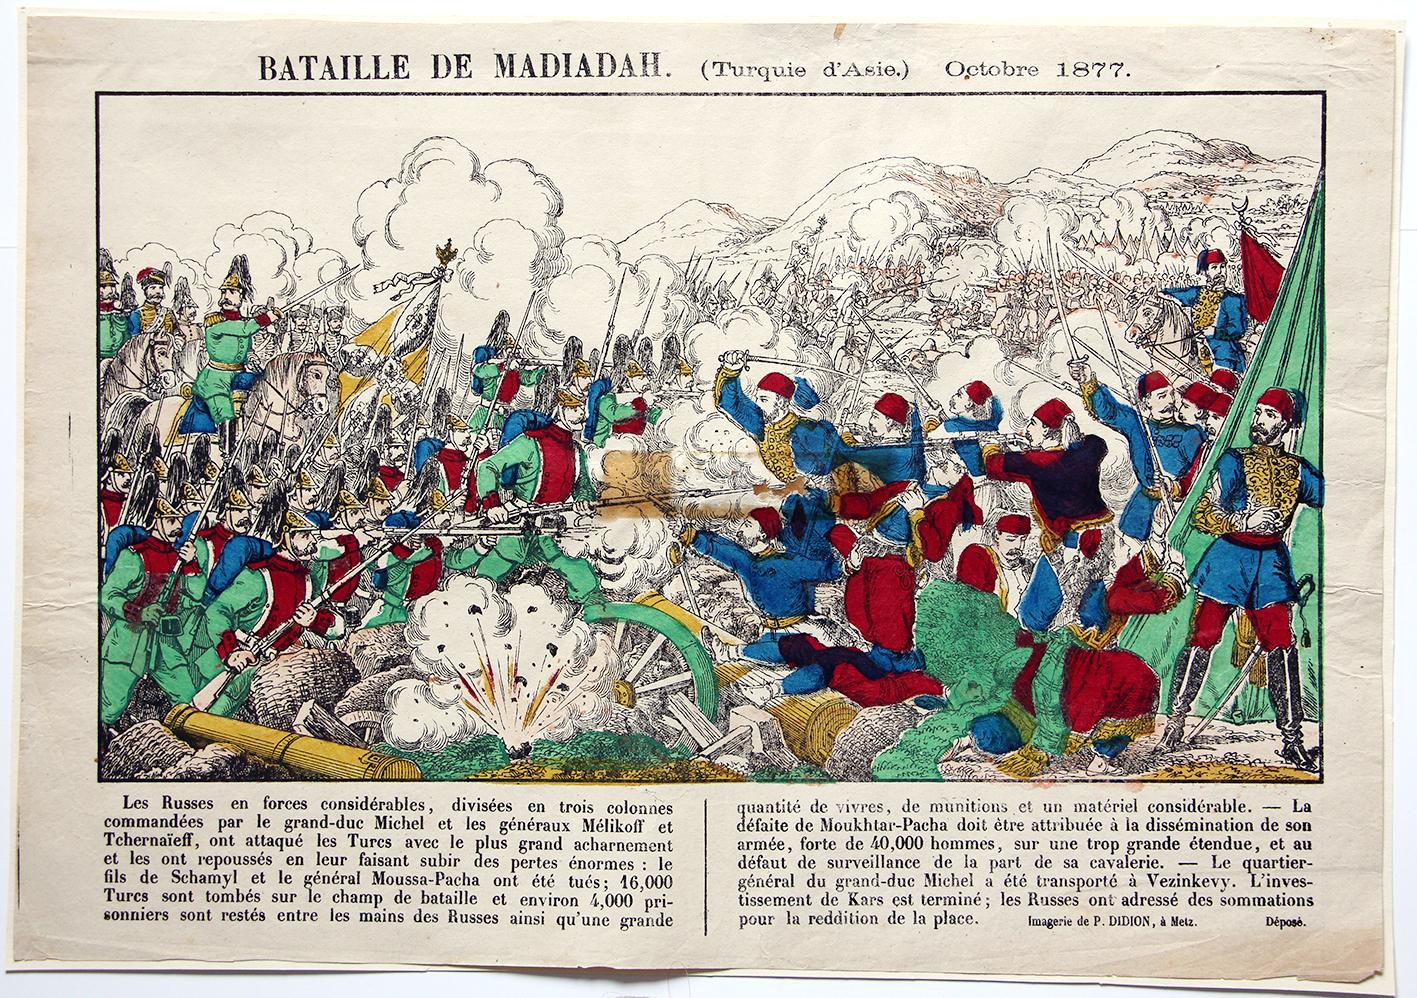 Planche imagerie didion Metz - Bataille de Madiadah - 1877 - Imagerie Populaire - Turquie